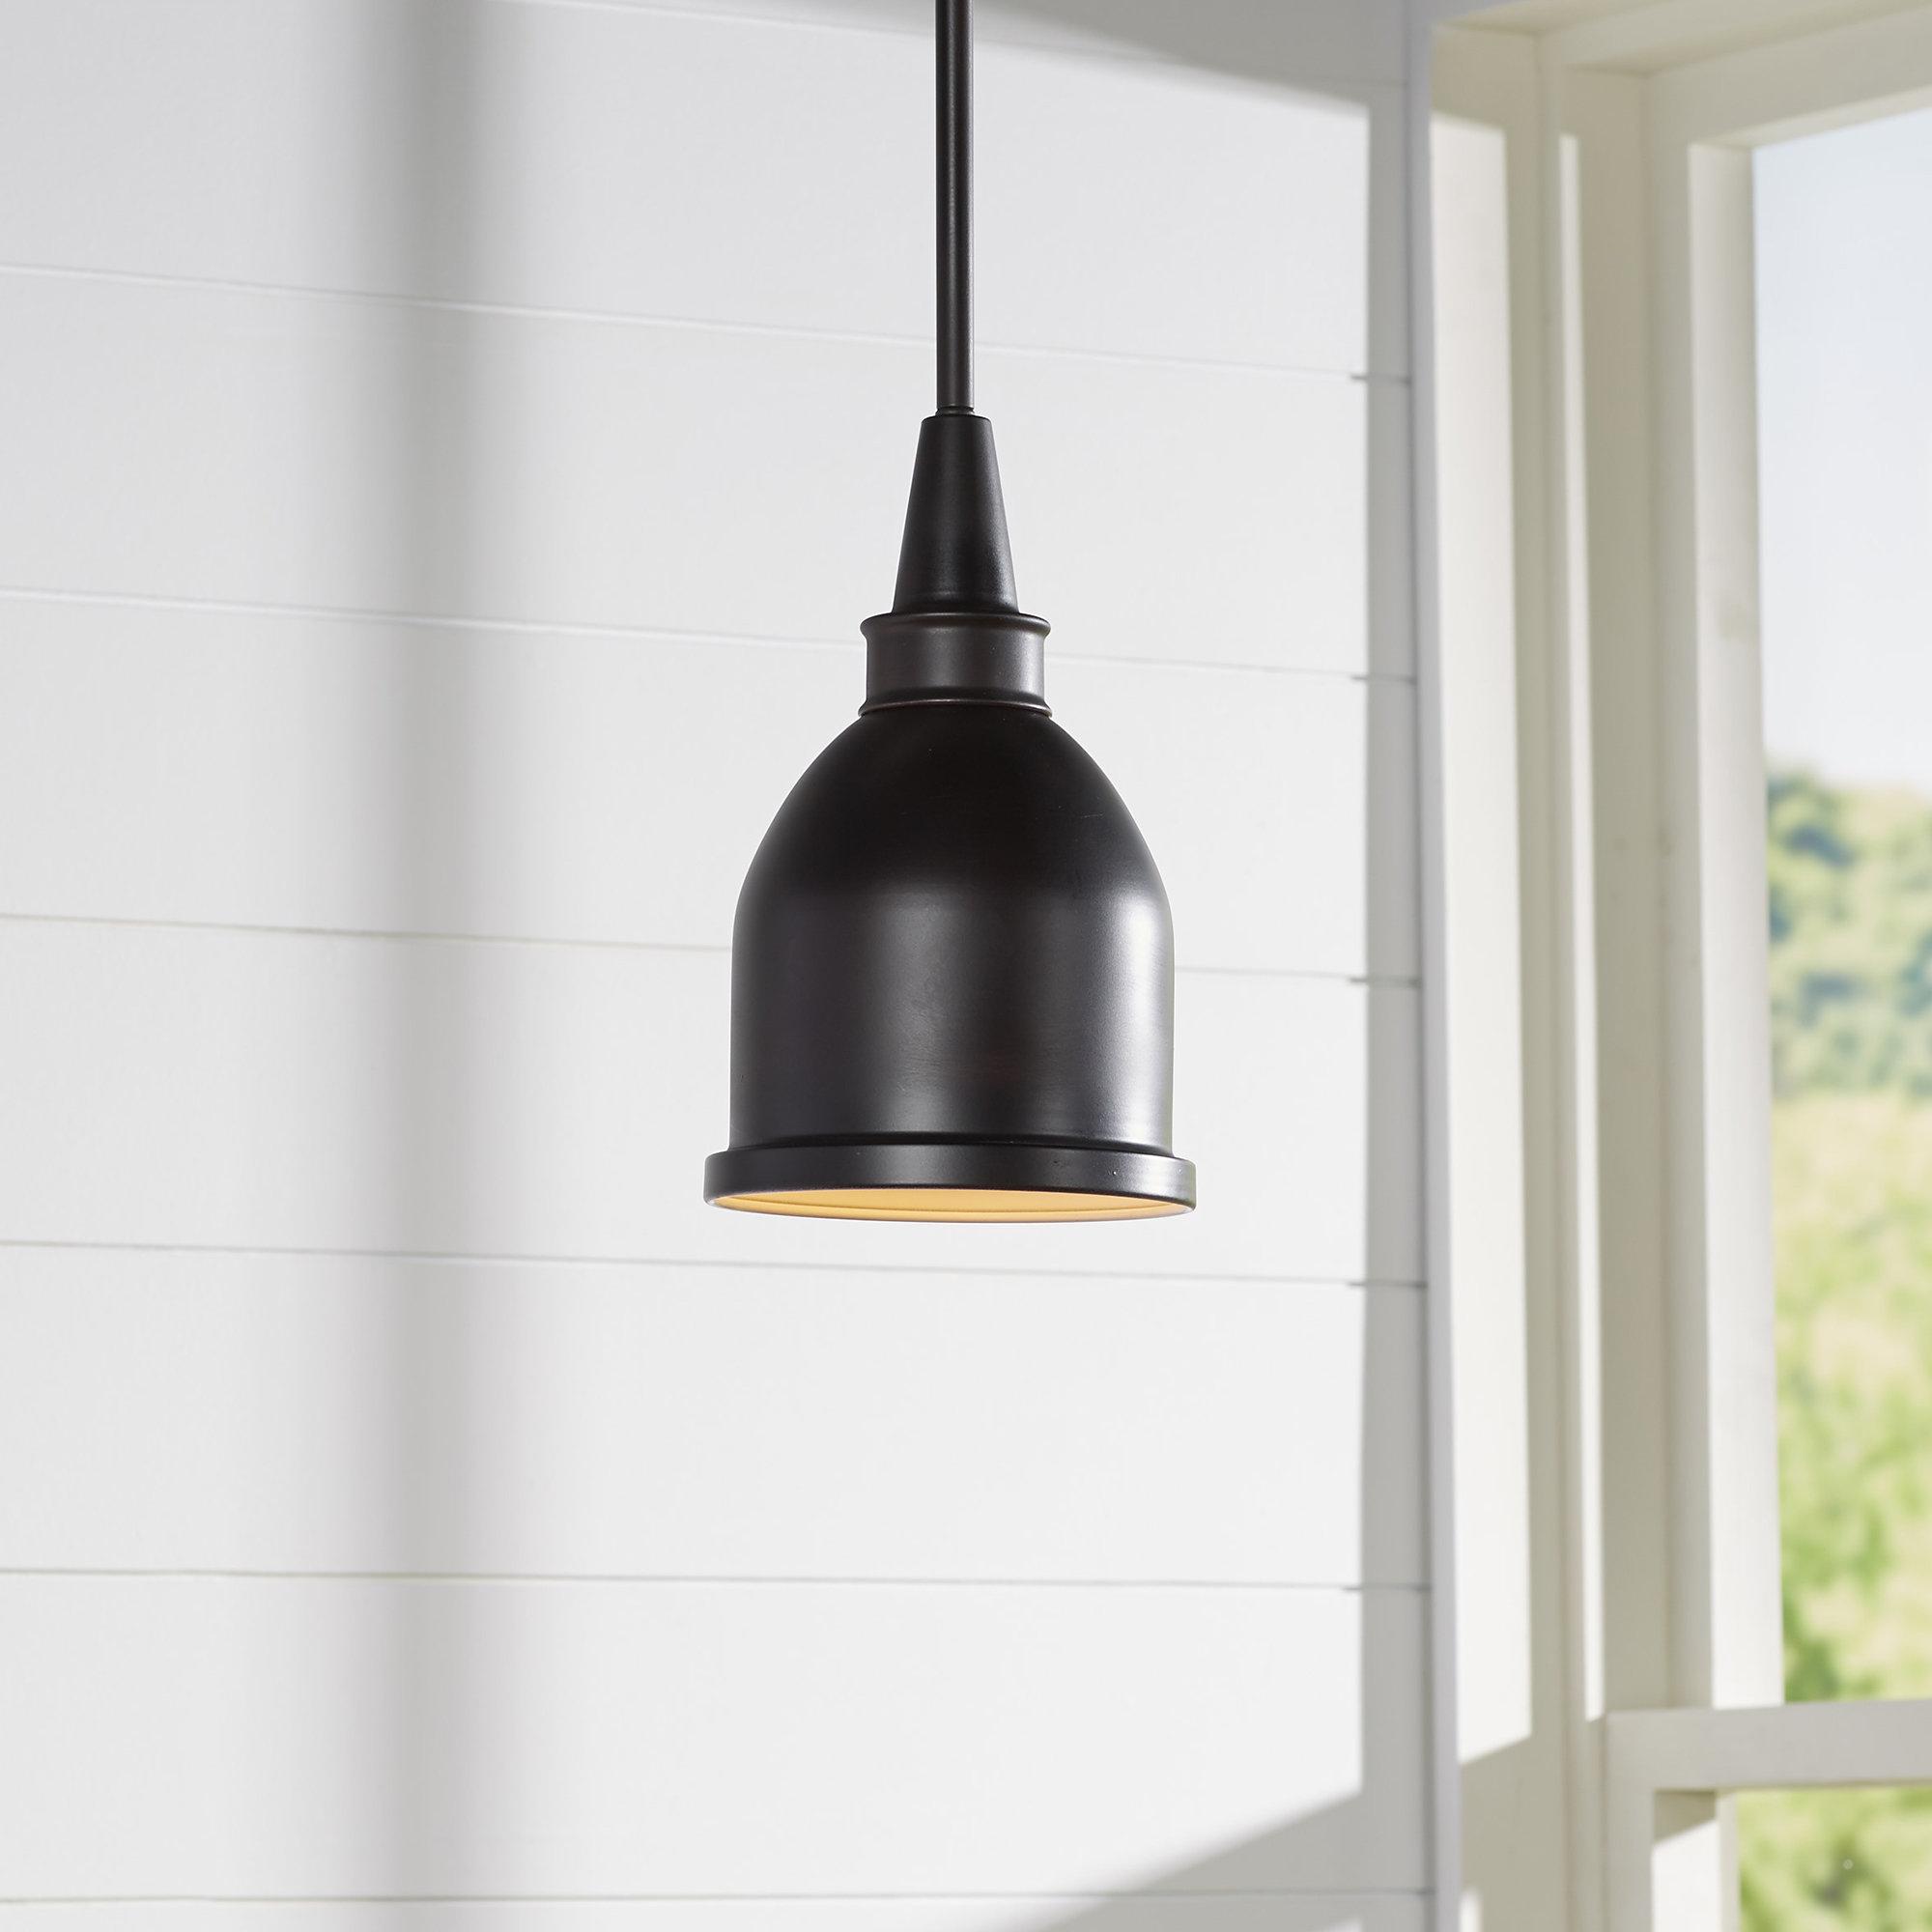 Hamilton 1 Light Single Dome Pendants In Current Manston 1 Light Single Bell Pendant (Gallery 8 of 25)